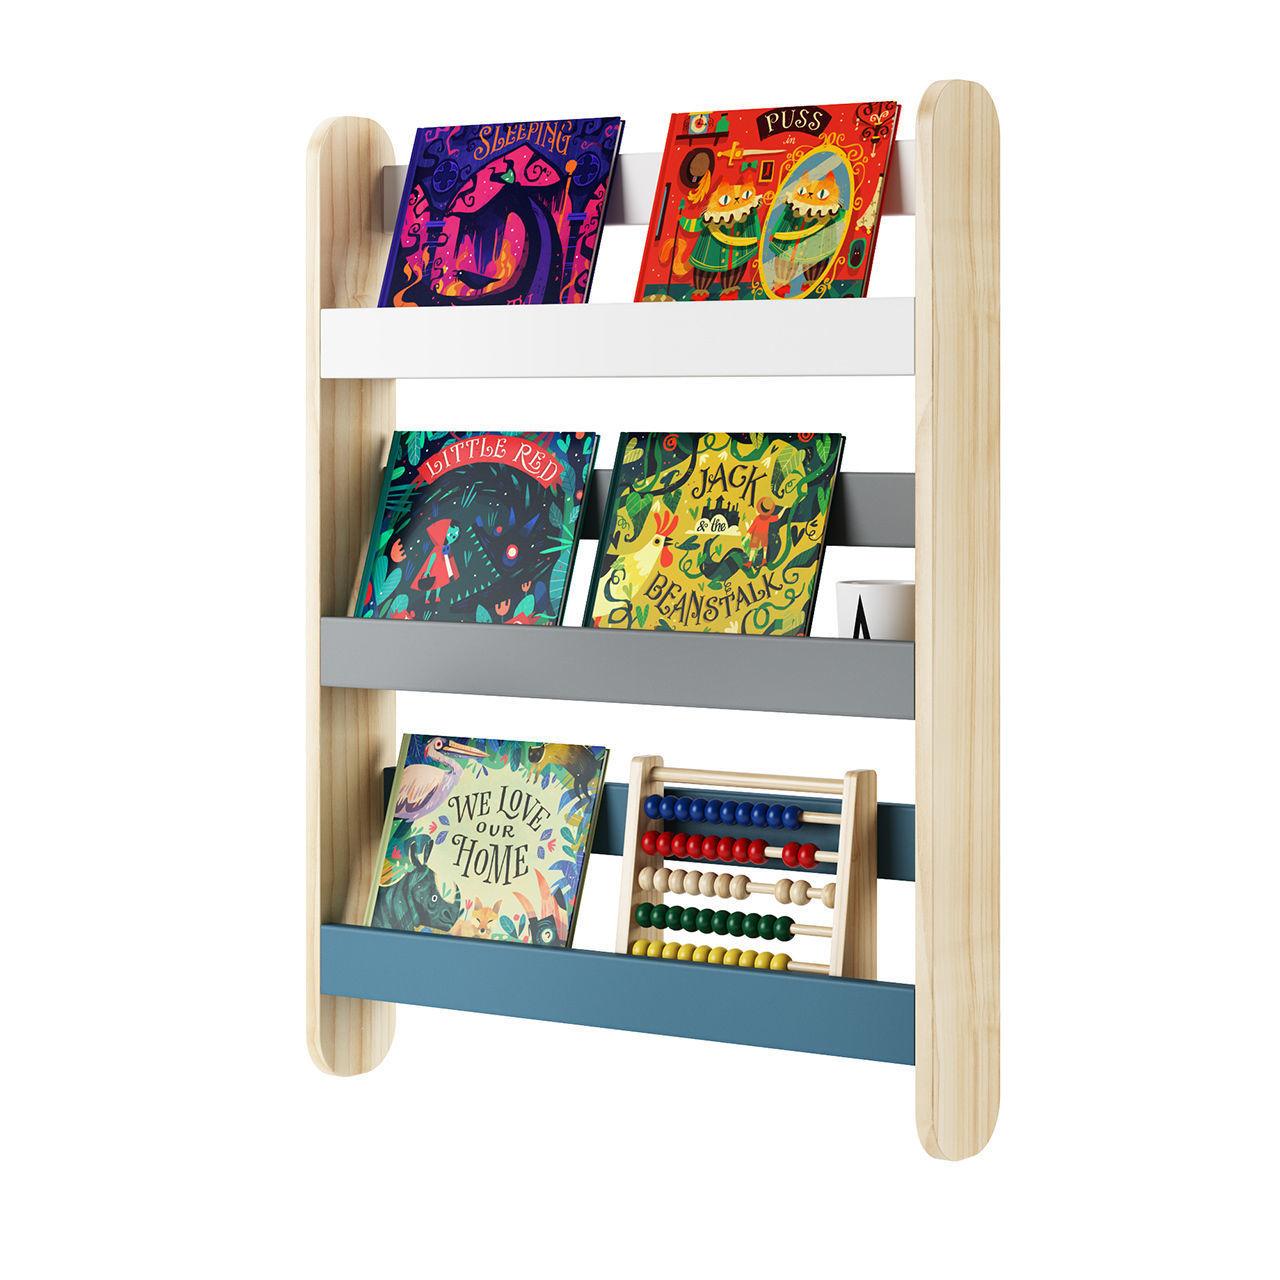 Essentials Spark Book Shelving by Made